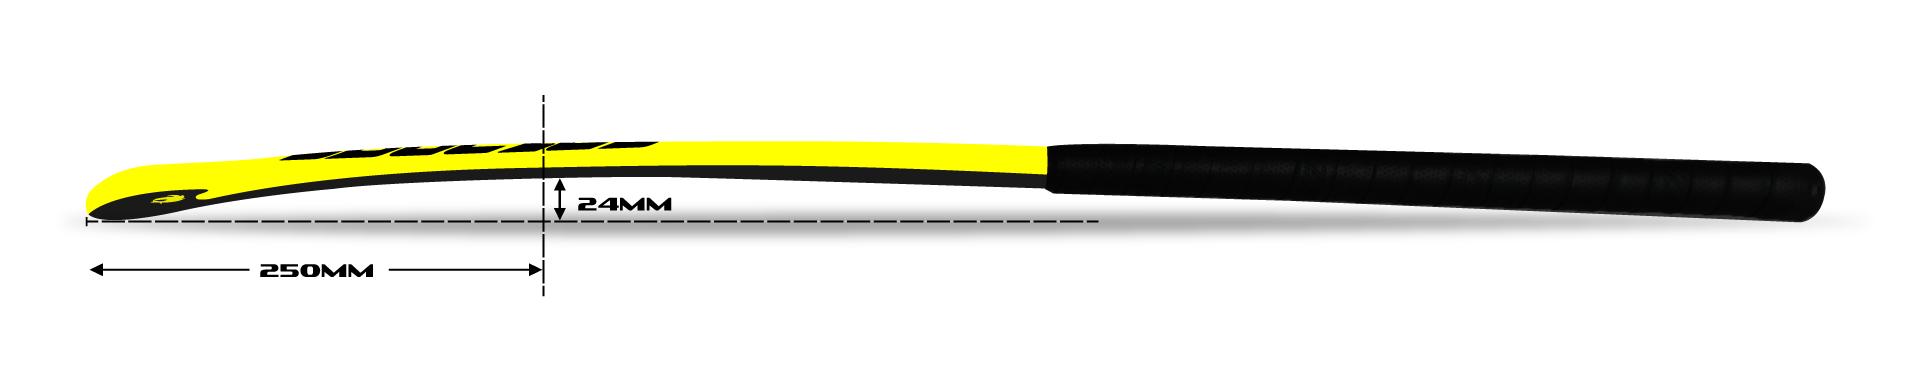 cazador hockeystick